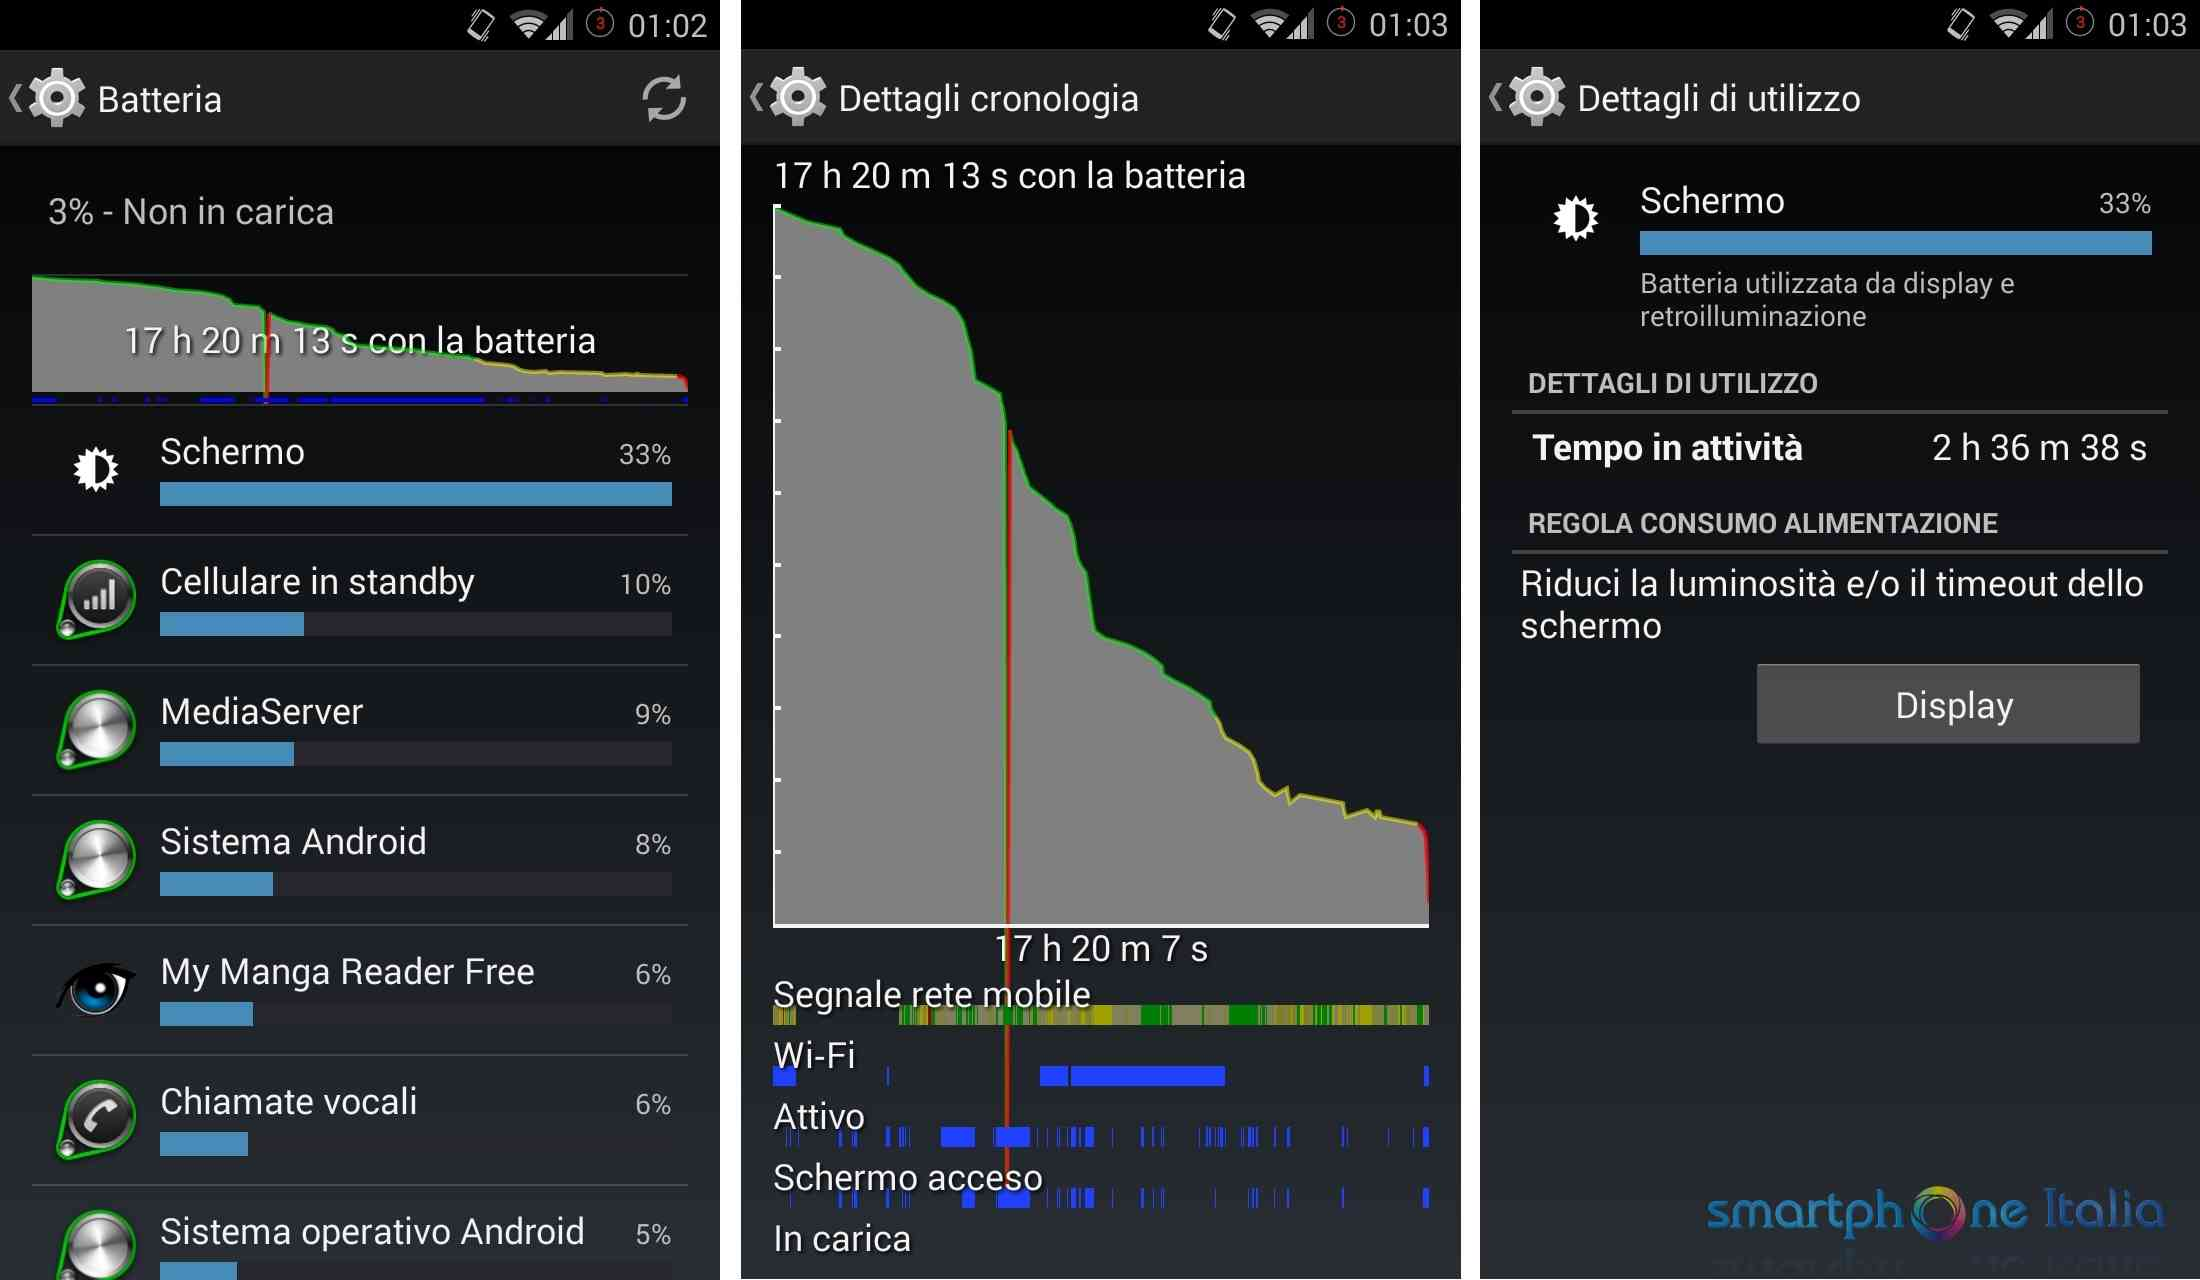 Recensione-CyanogenMod-11-Nightly-KitKat-su-Galaxy-SIII-by-Smartphone-Italia-Forum-screenshot-batteria